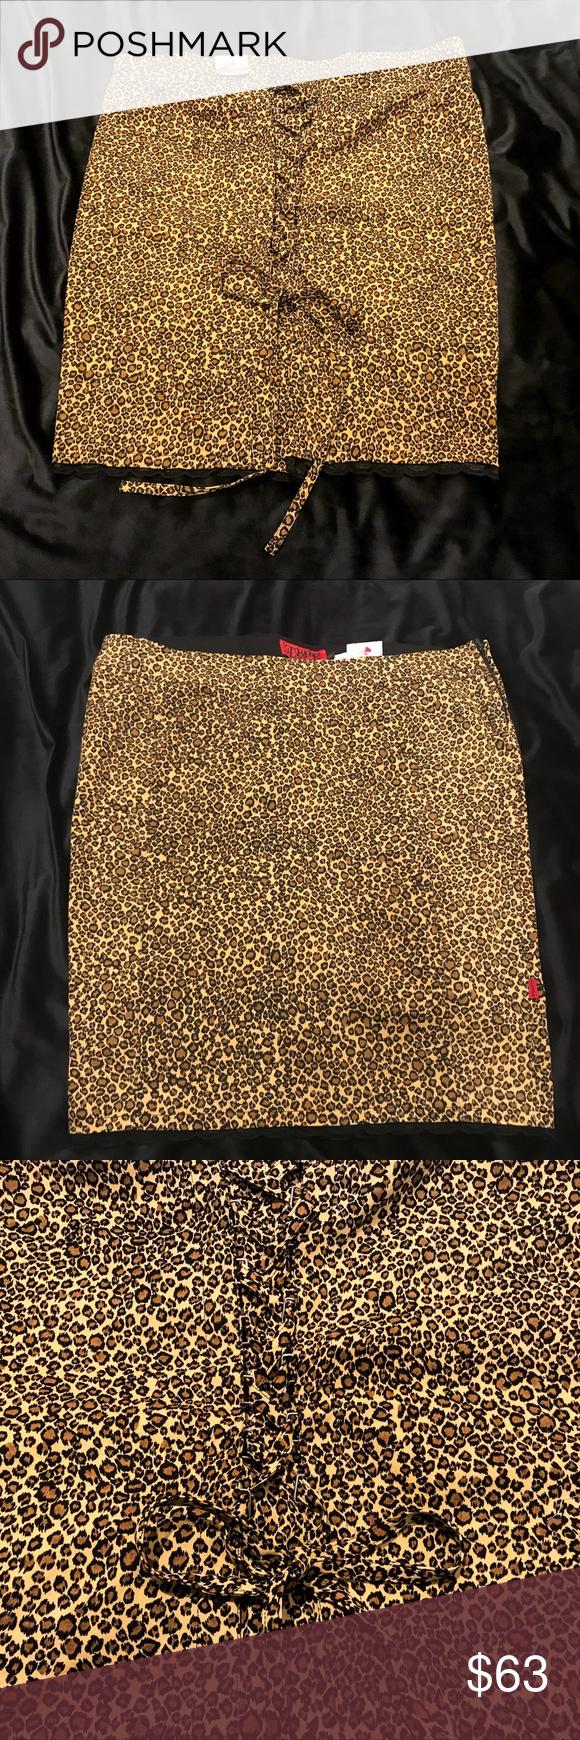 74d1df0e9bf NWT Torrid Pin Up Girl Leopard Corset Back Skirt. CorsetPencil  SkirtsTorridNycBlack LacesLeopardsSexyTagsBustiers